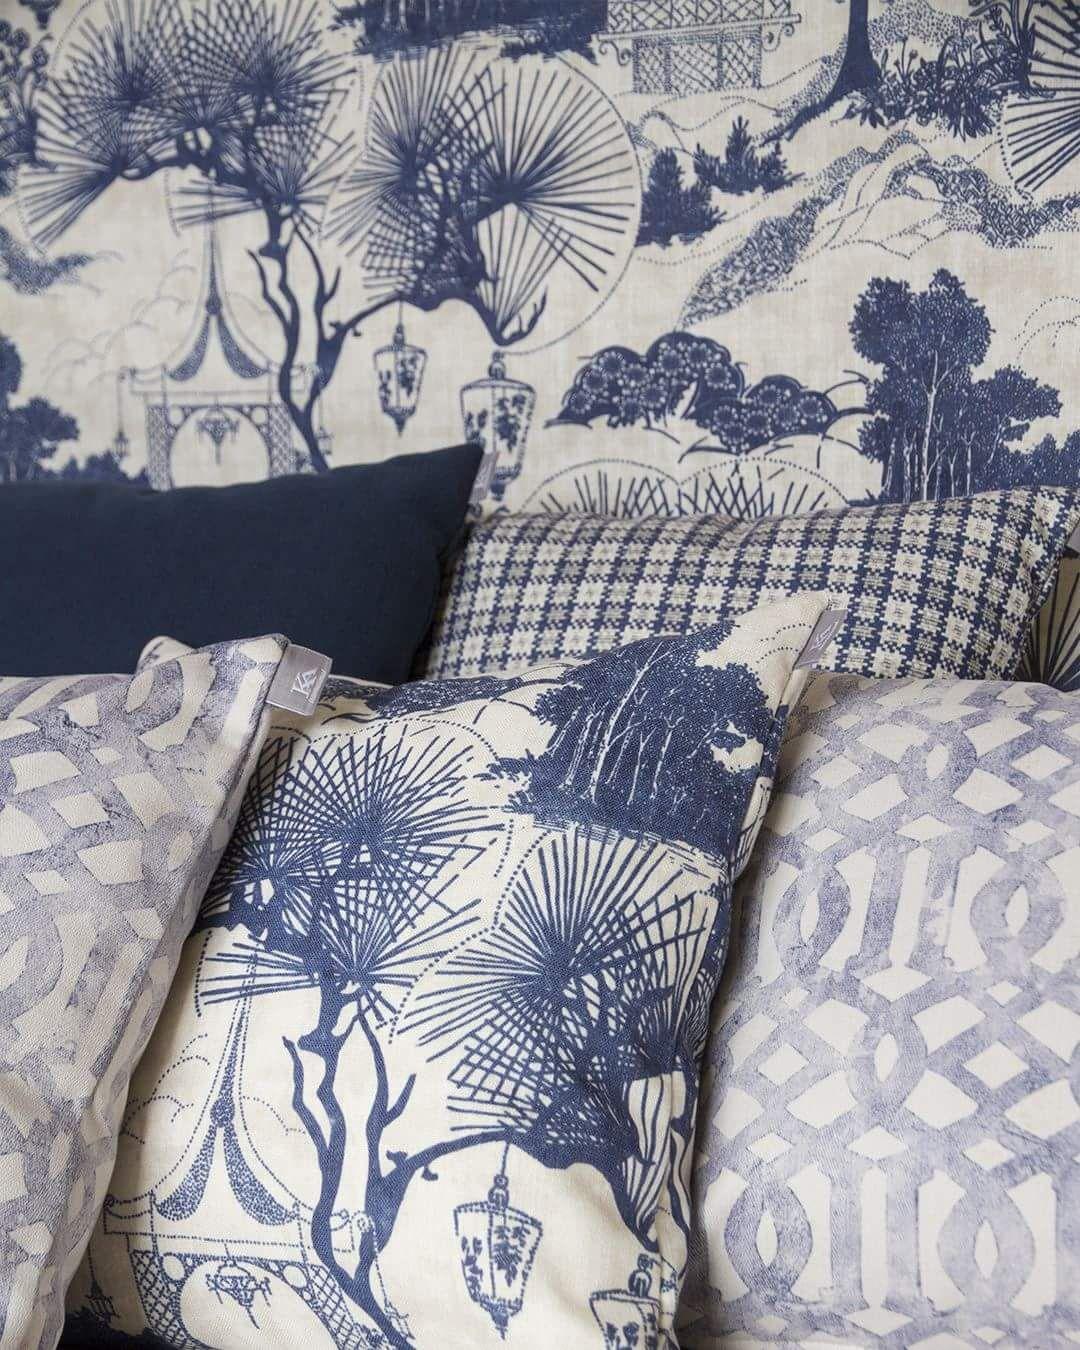 Textil: Servicios de KA International